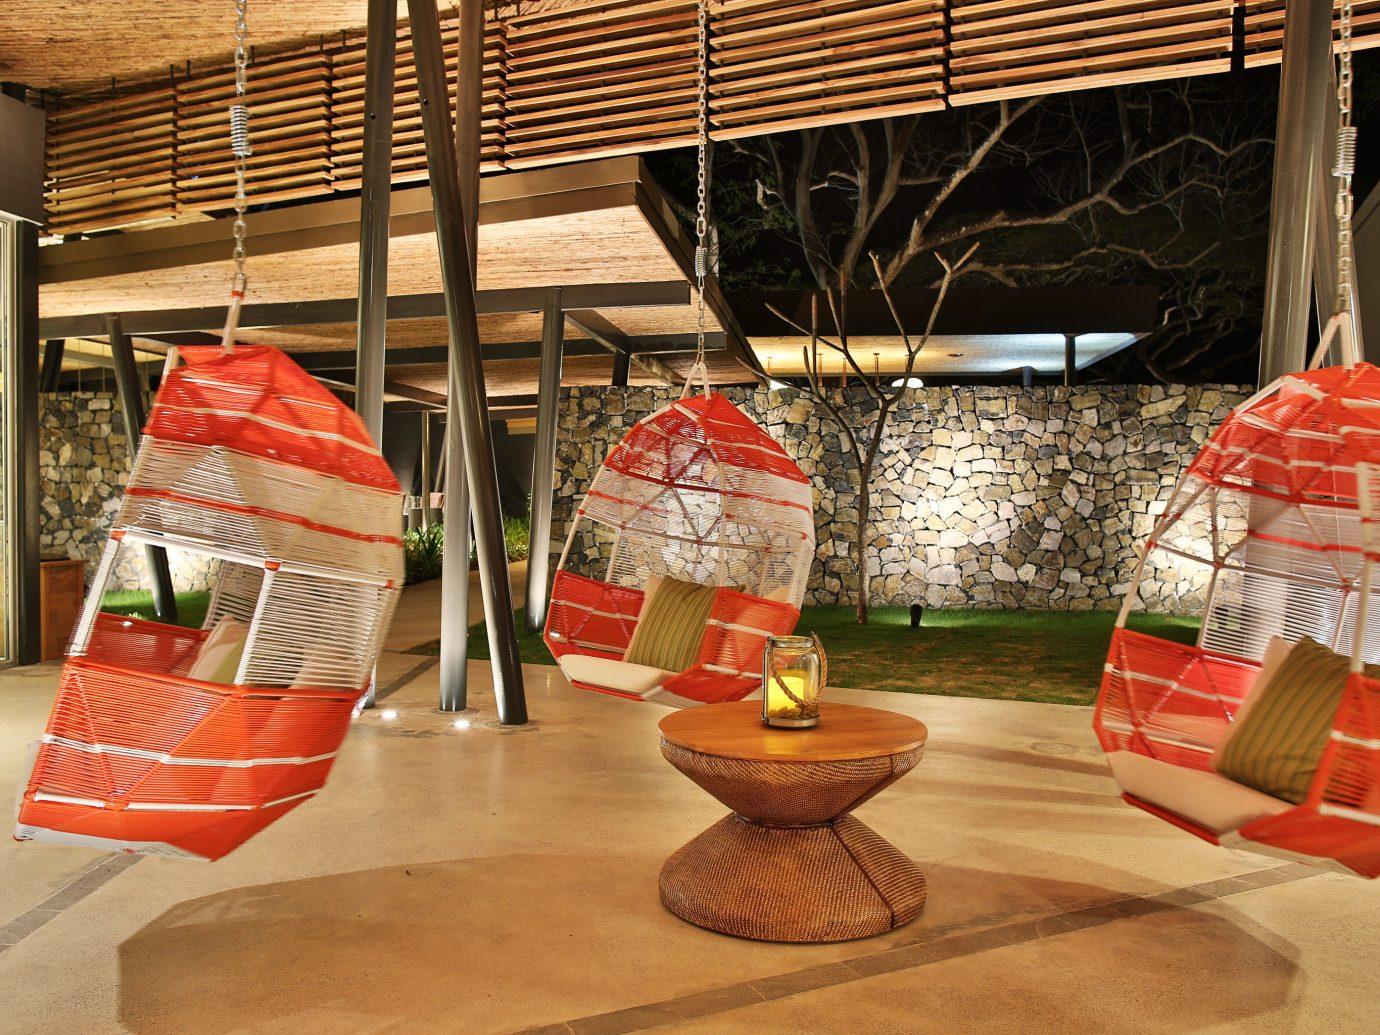 Guanacaste Hotel Papagayo, Costa Rica